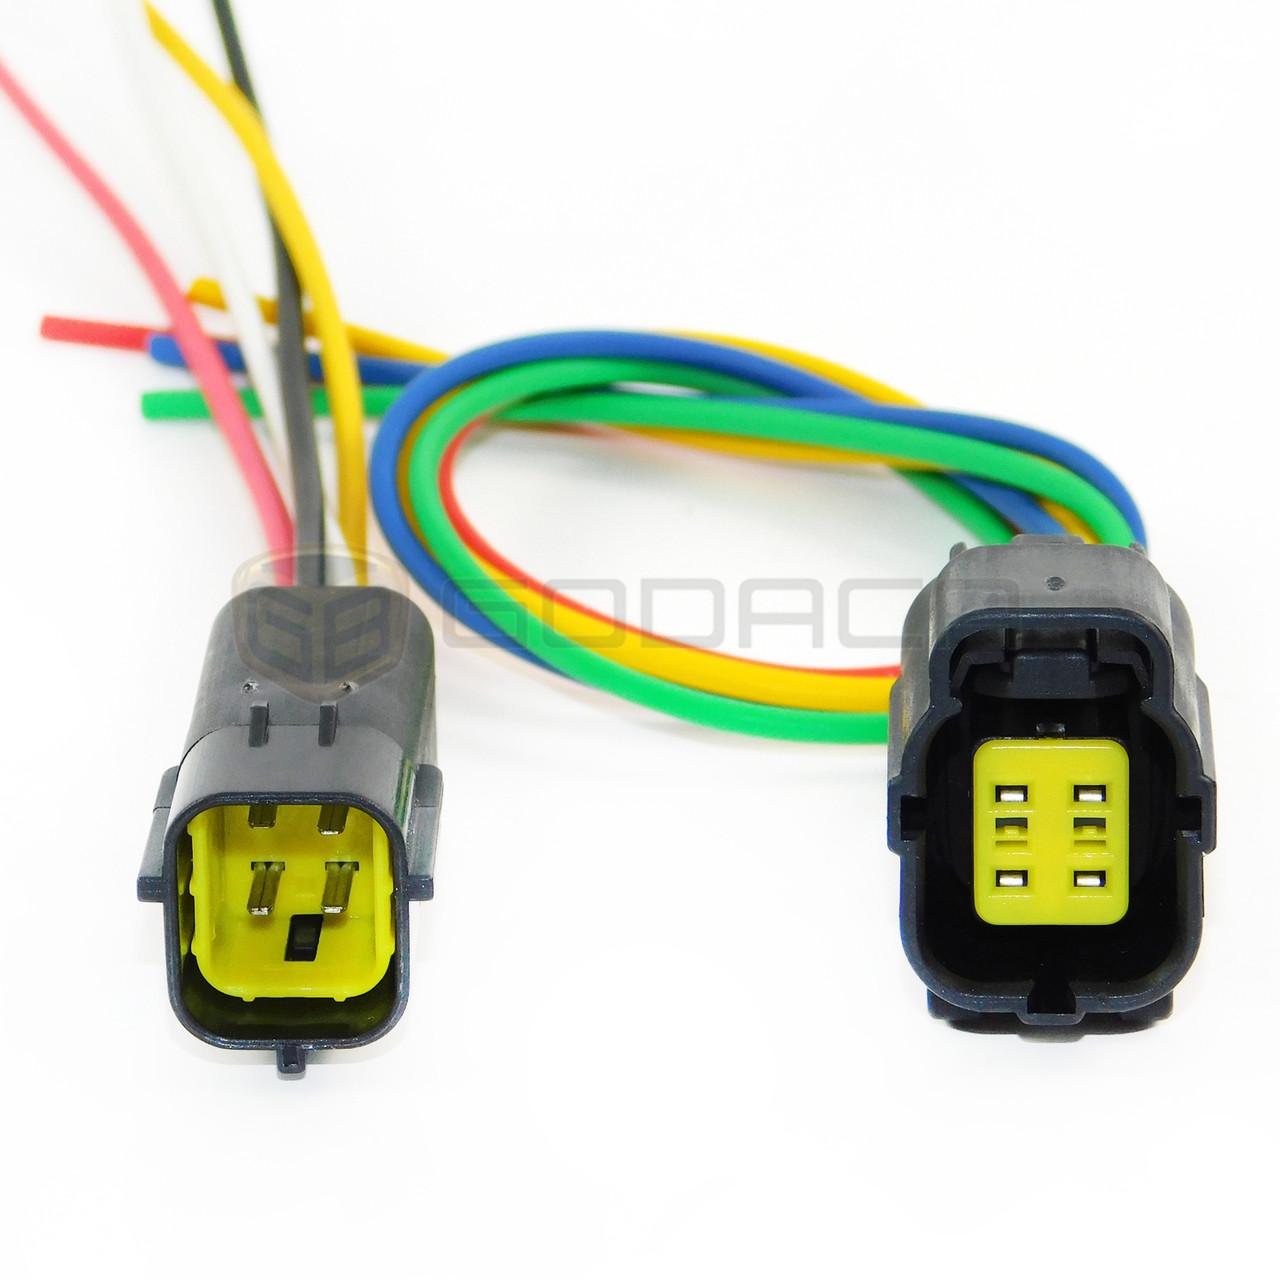 small resolution of 1 x female male connector harness pigtail o2 oxygen sensor chevrolet ford honda godaca llc